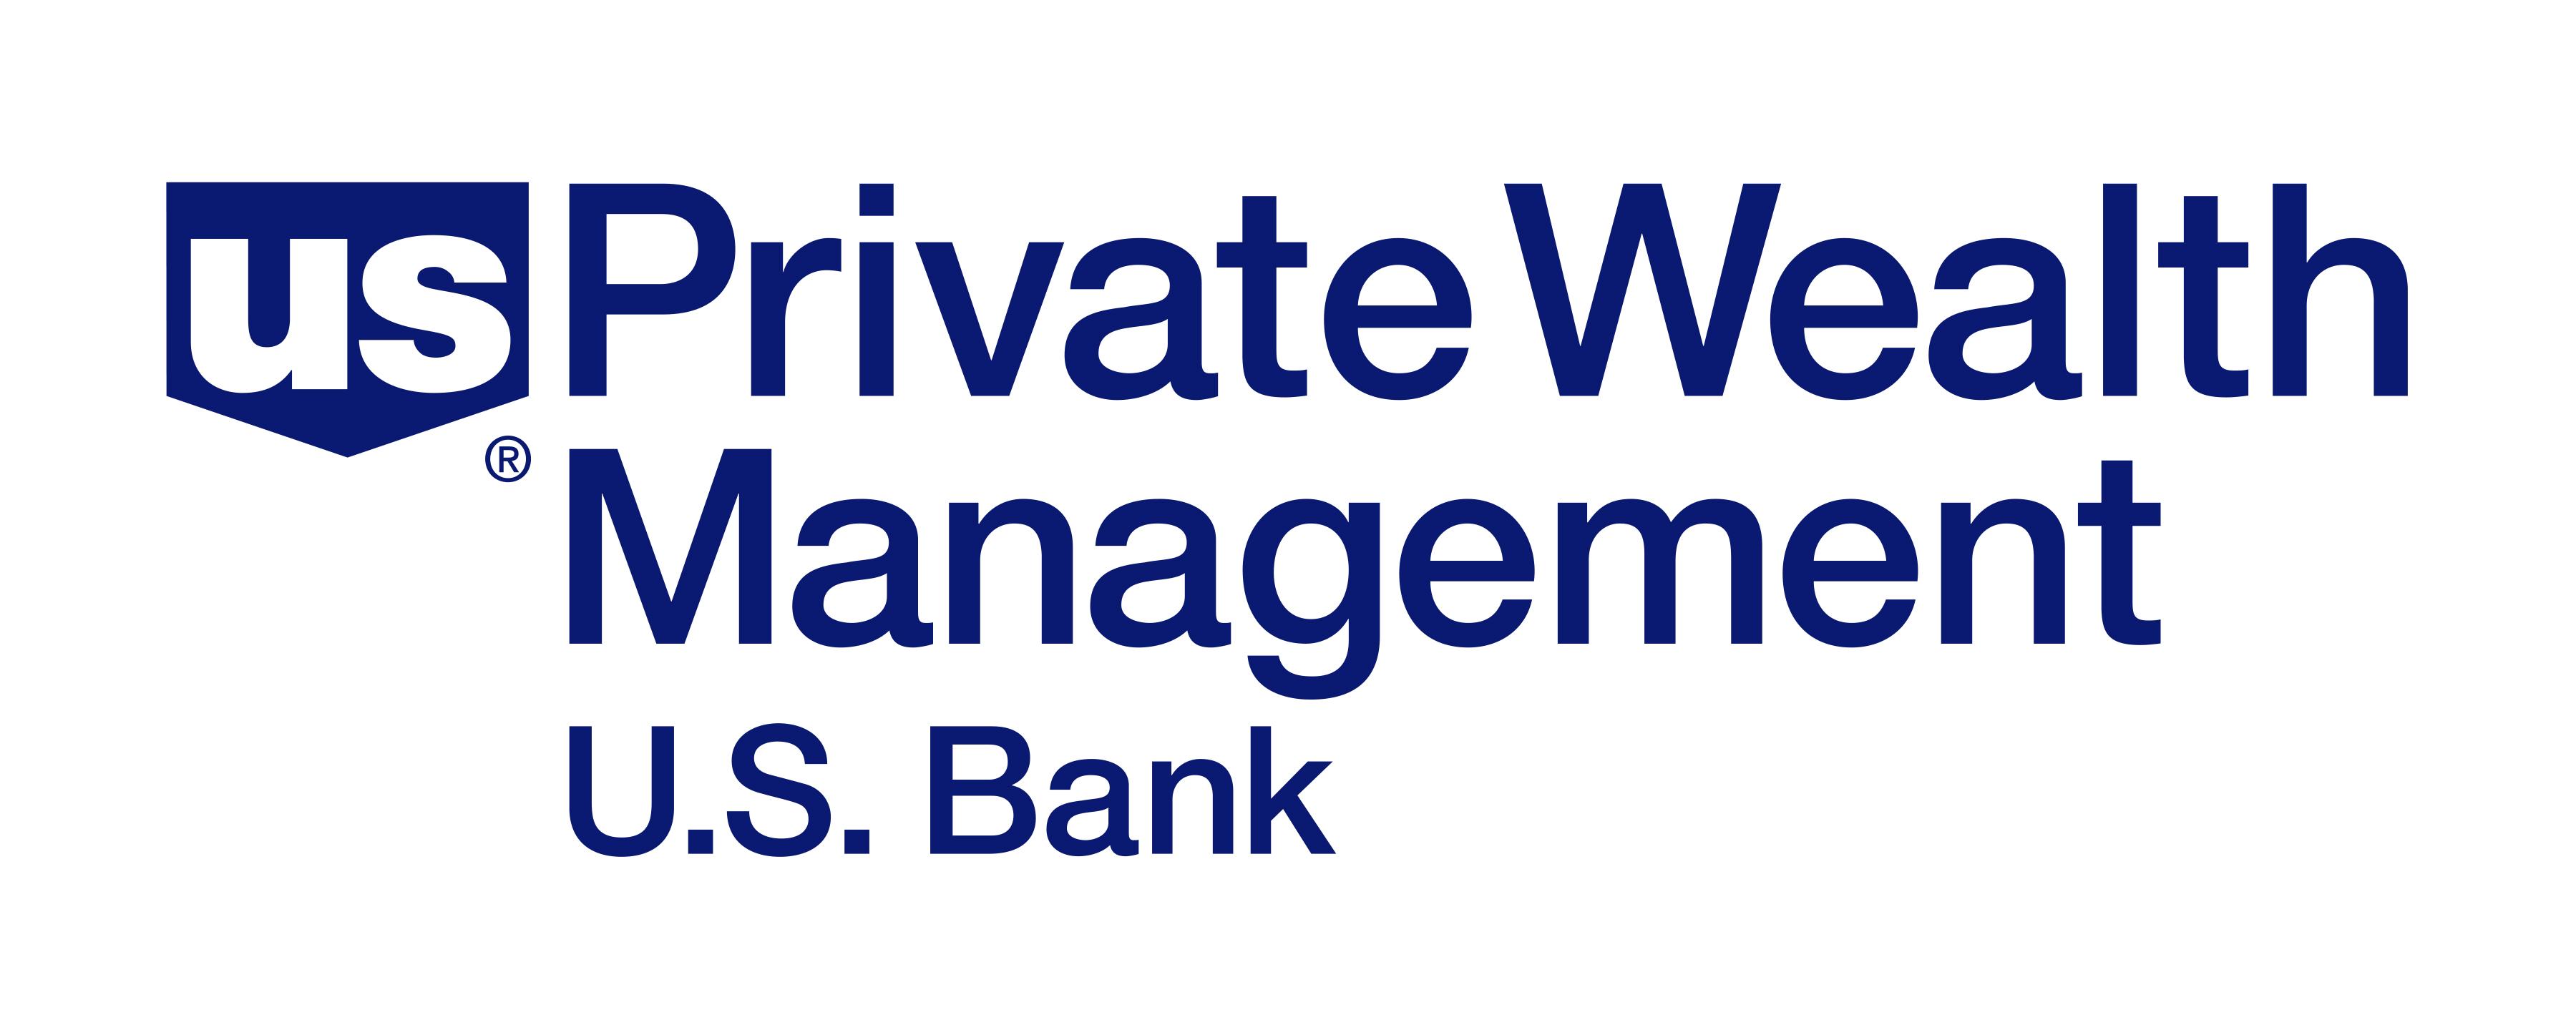 US-Bank-Private-Wealth-Management-Logo.